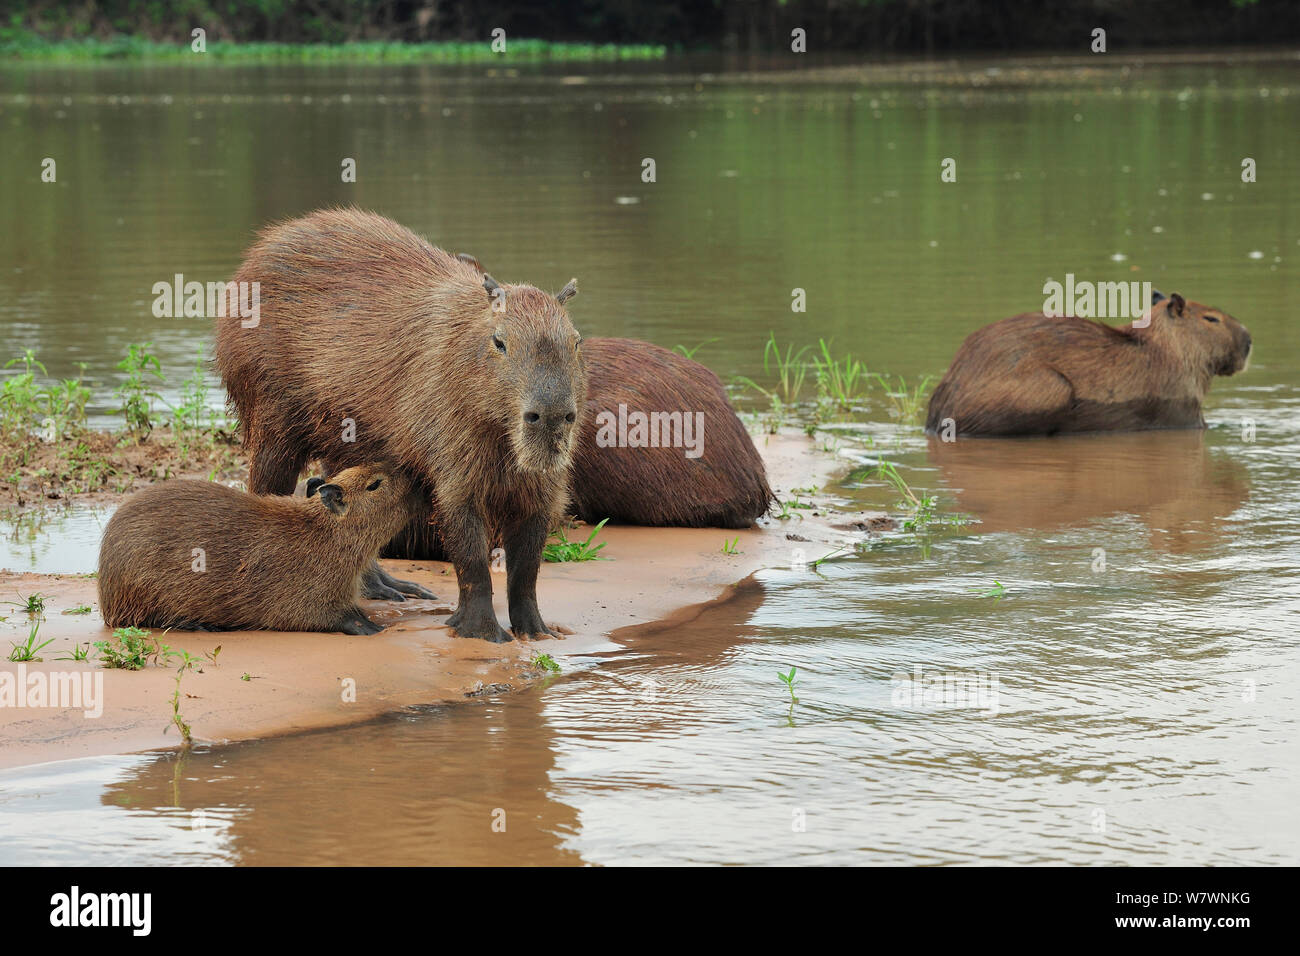 Family of Capybaras (Hydrochoerus hydrochaeris) in Cuiaba River, Pantanal of Mato Grosso, Mato Grosso State, Western Brazil. Stock Photo